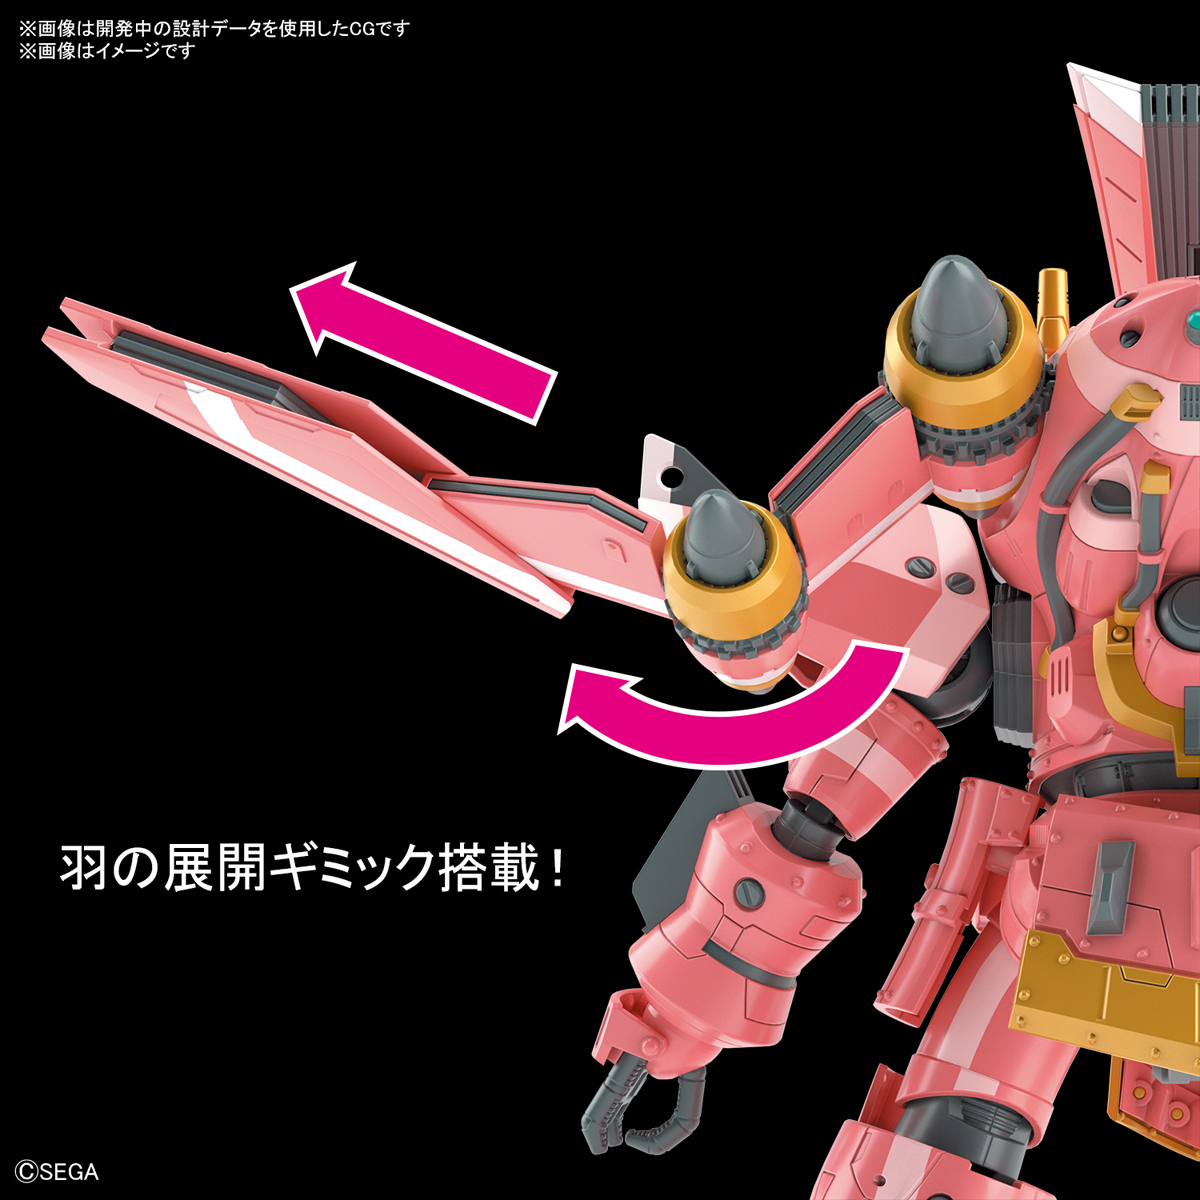 HG 1/24『霊子戦闘機・試製桜武(天宮さくら機)』新サクラ大戦 プラモデル-003